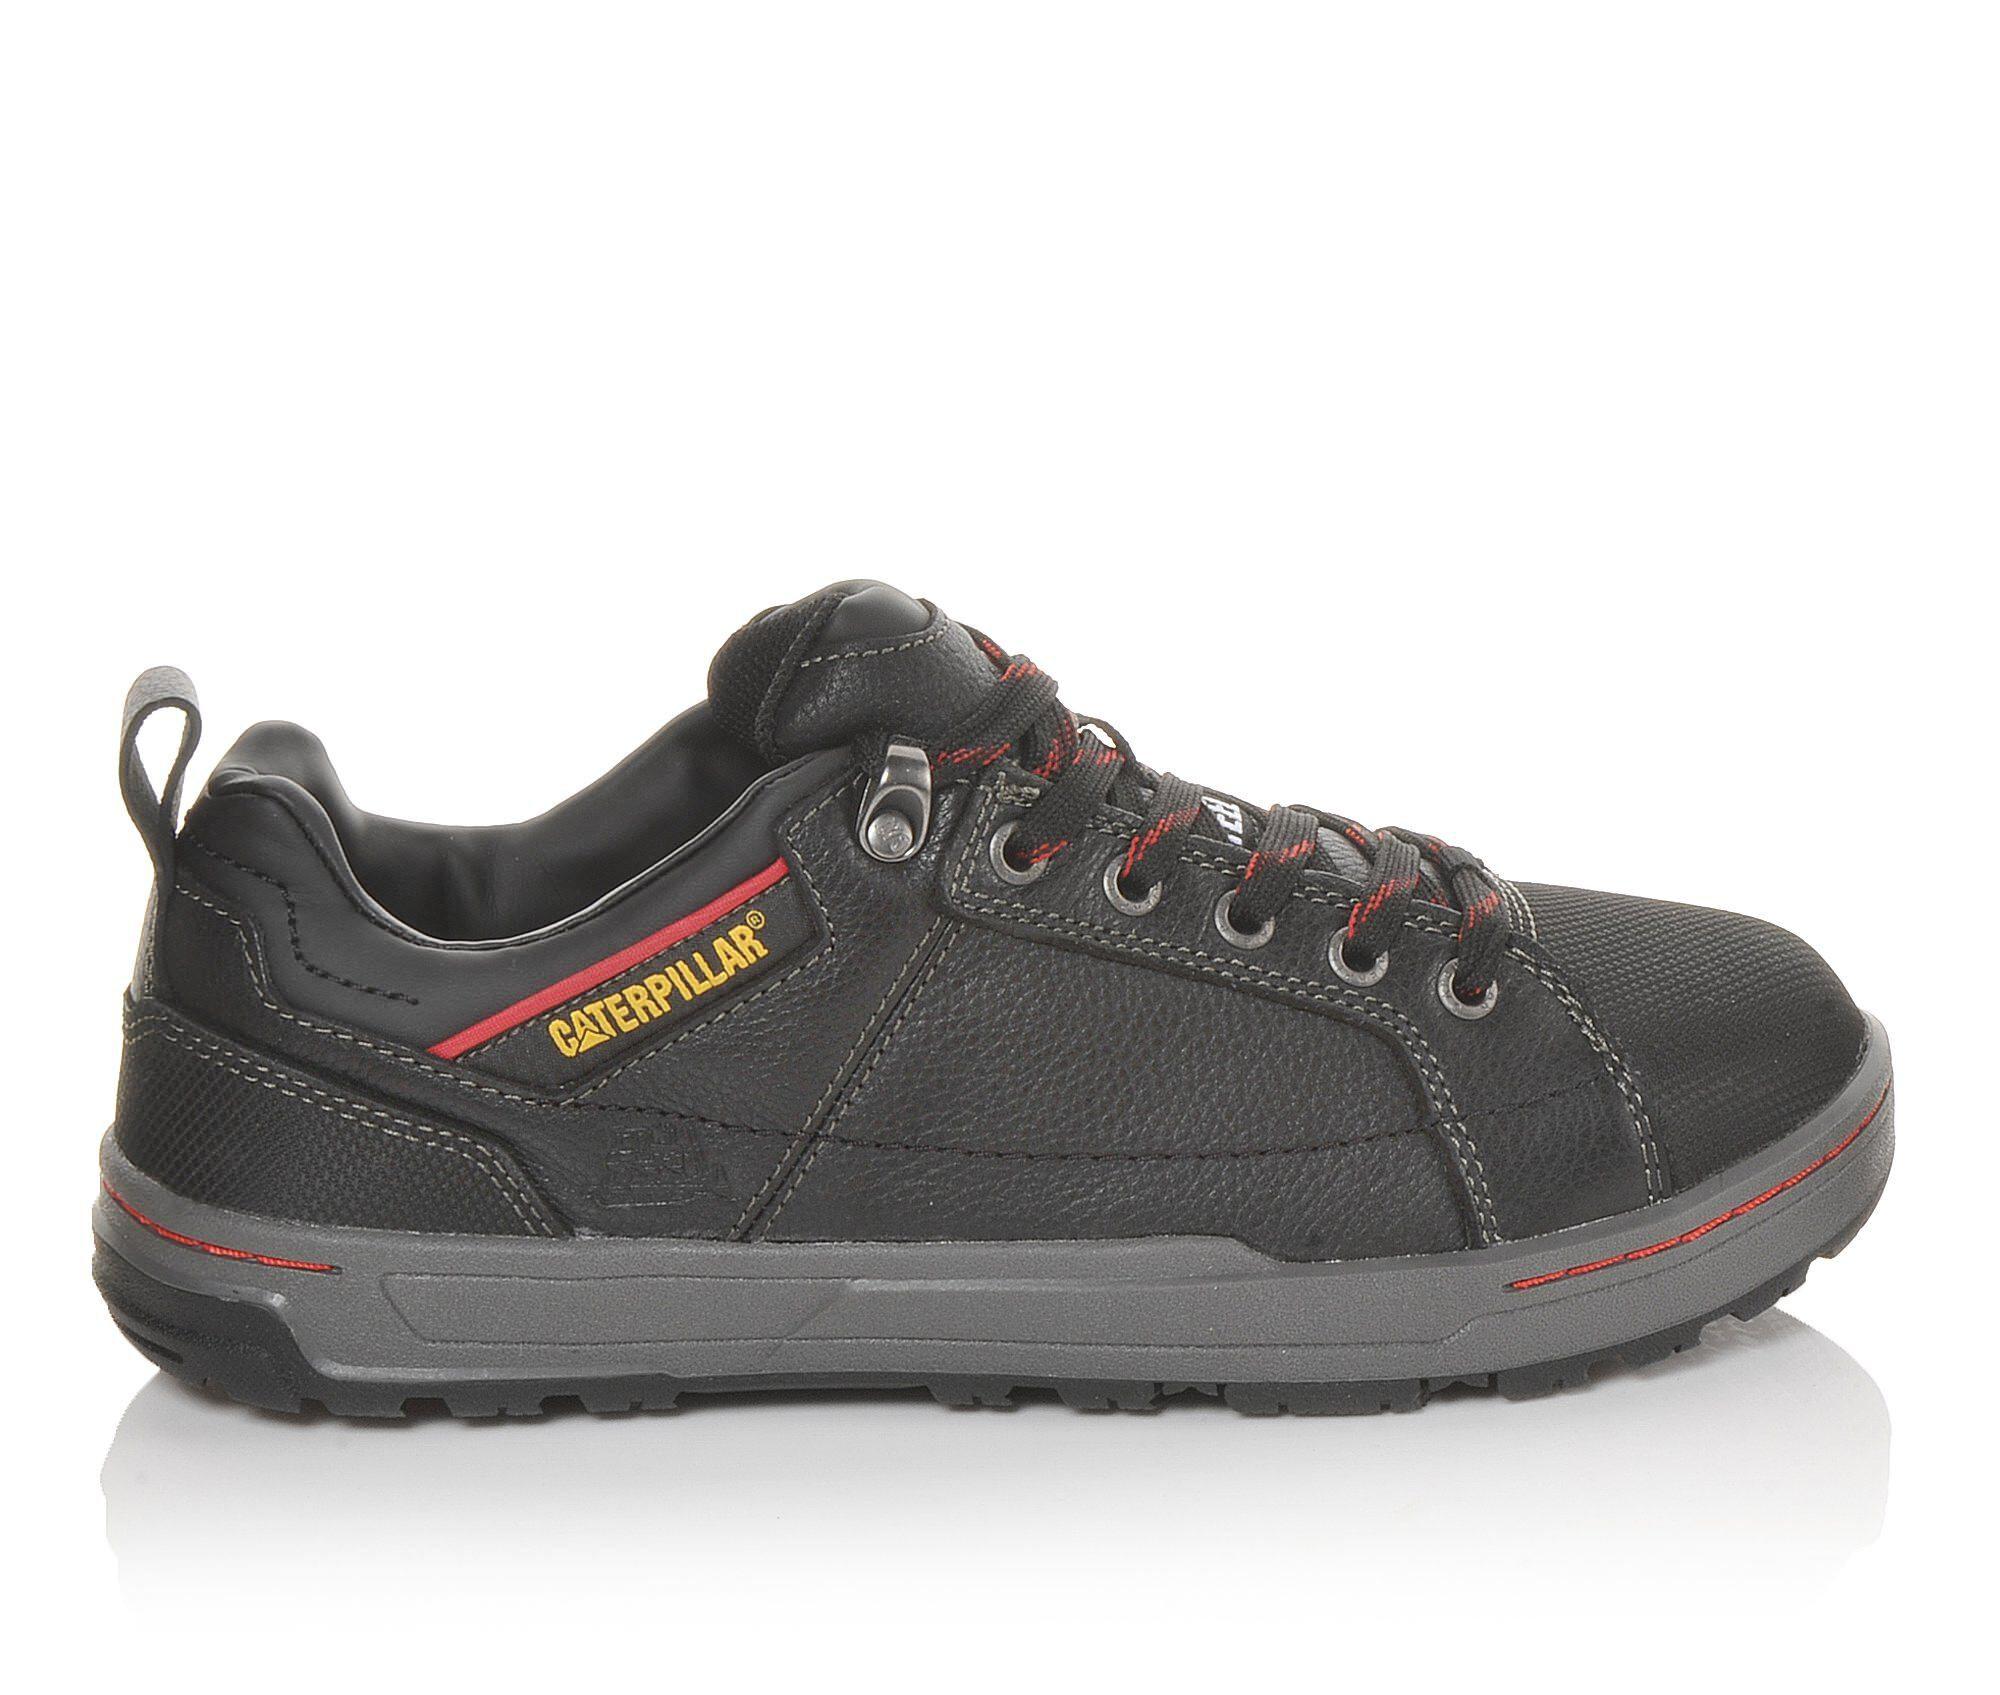 Men's Caterpillar Brode Steel Toe Oxford Work Shoes Black